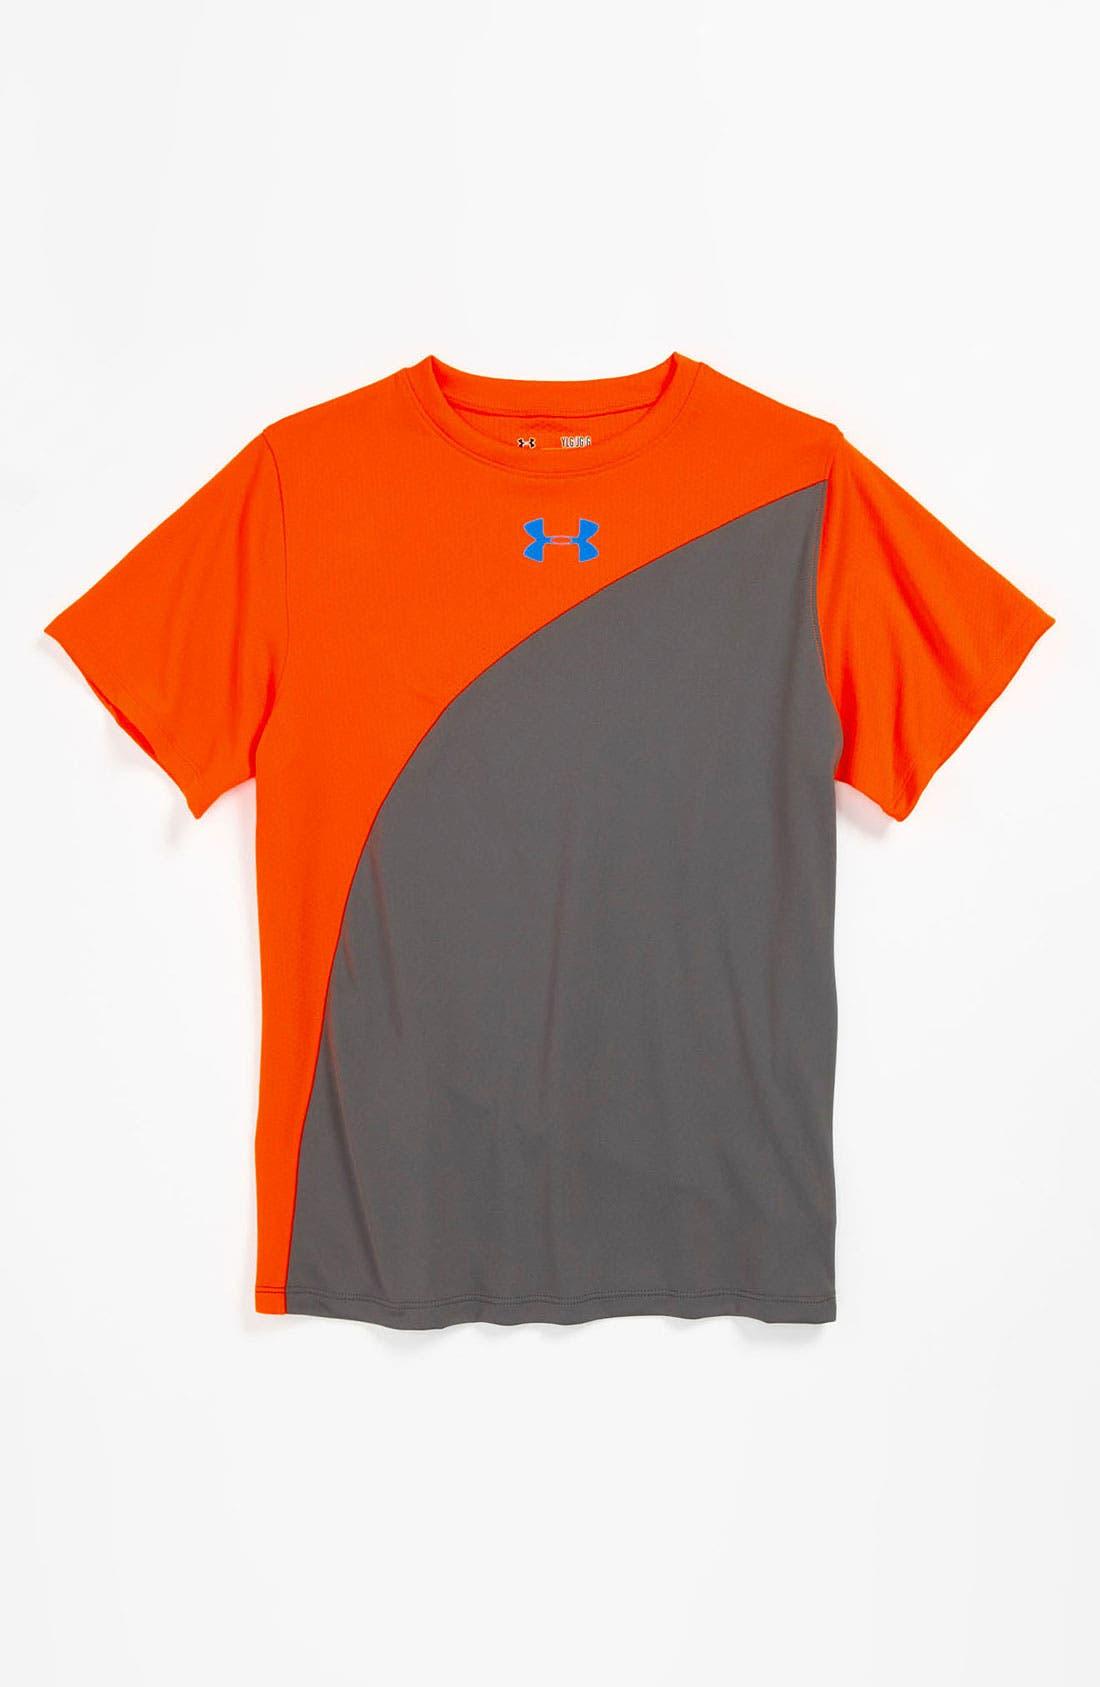 Alternate Image 1 Selected - Under Armour 'Influencer' Shirt (Big Boys)